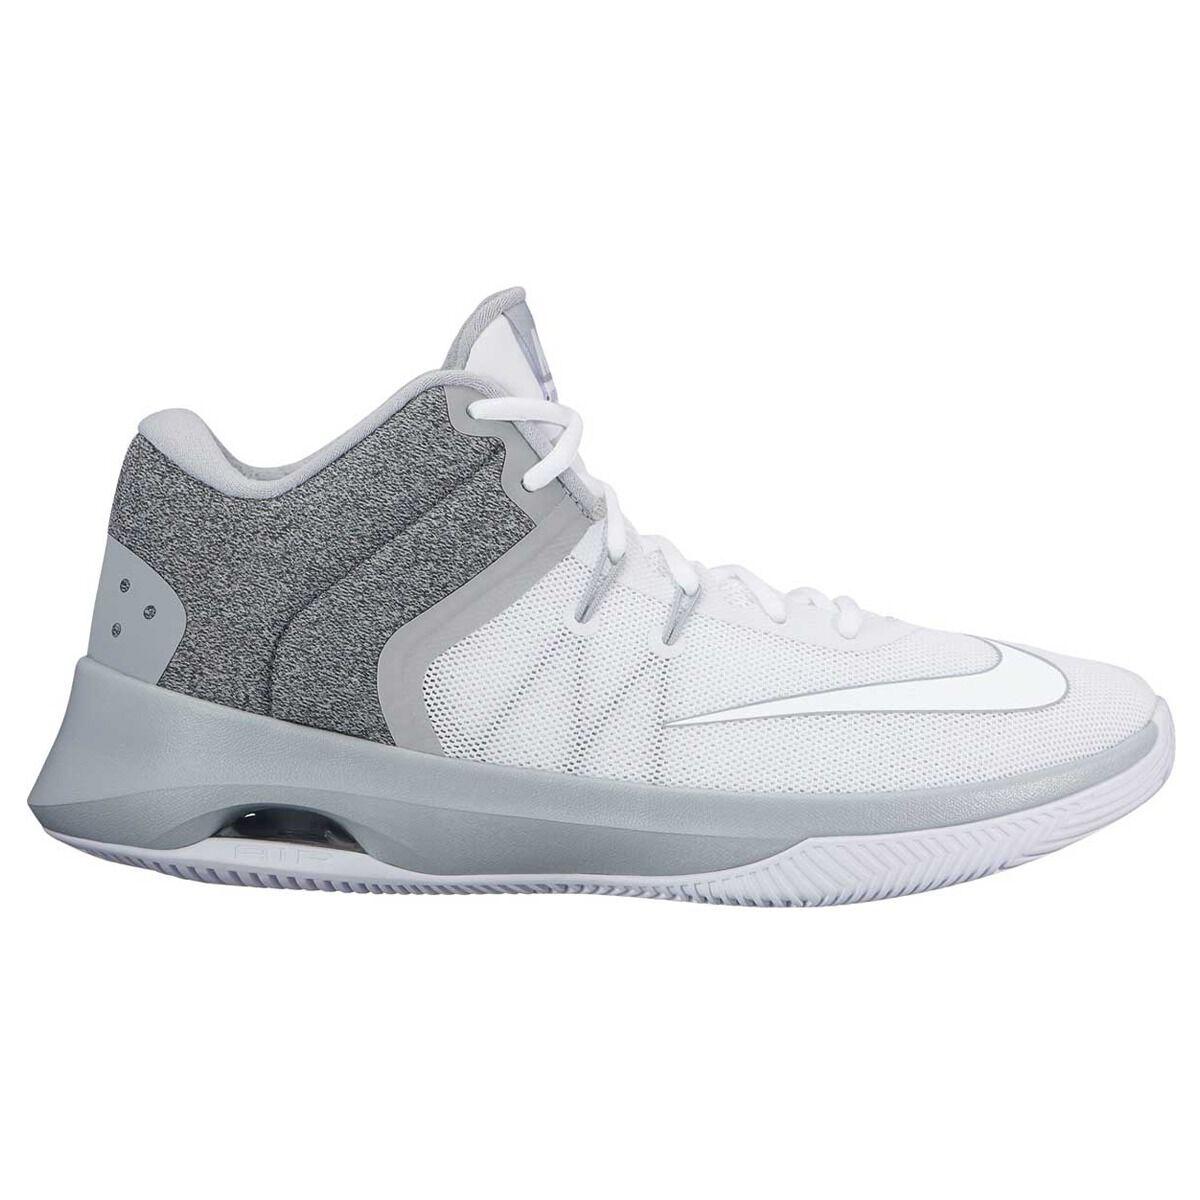 huge selection of 2db36 5f902 ... closeout nike air versatile ii mens basketball shoe white grey rebelhi  res 6cecb 9effe